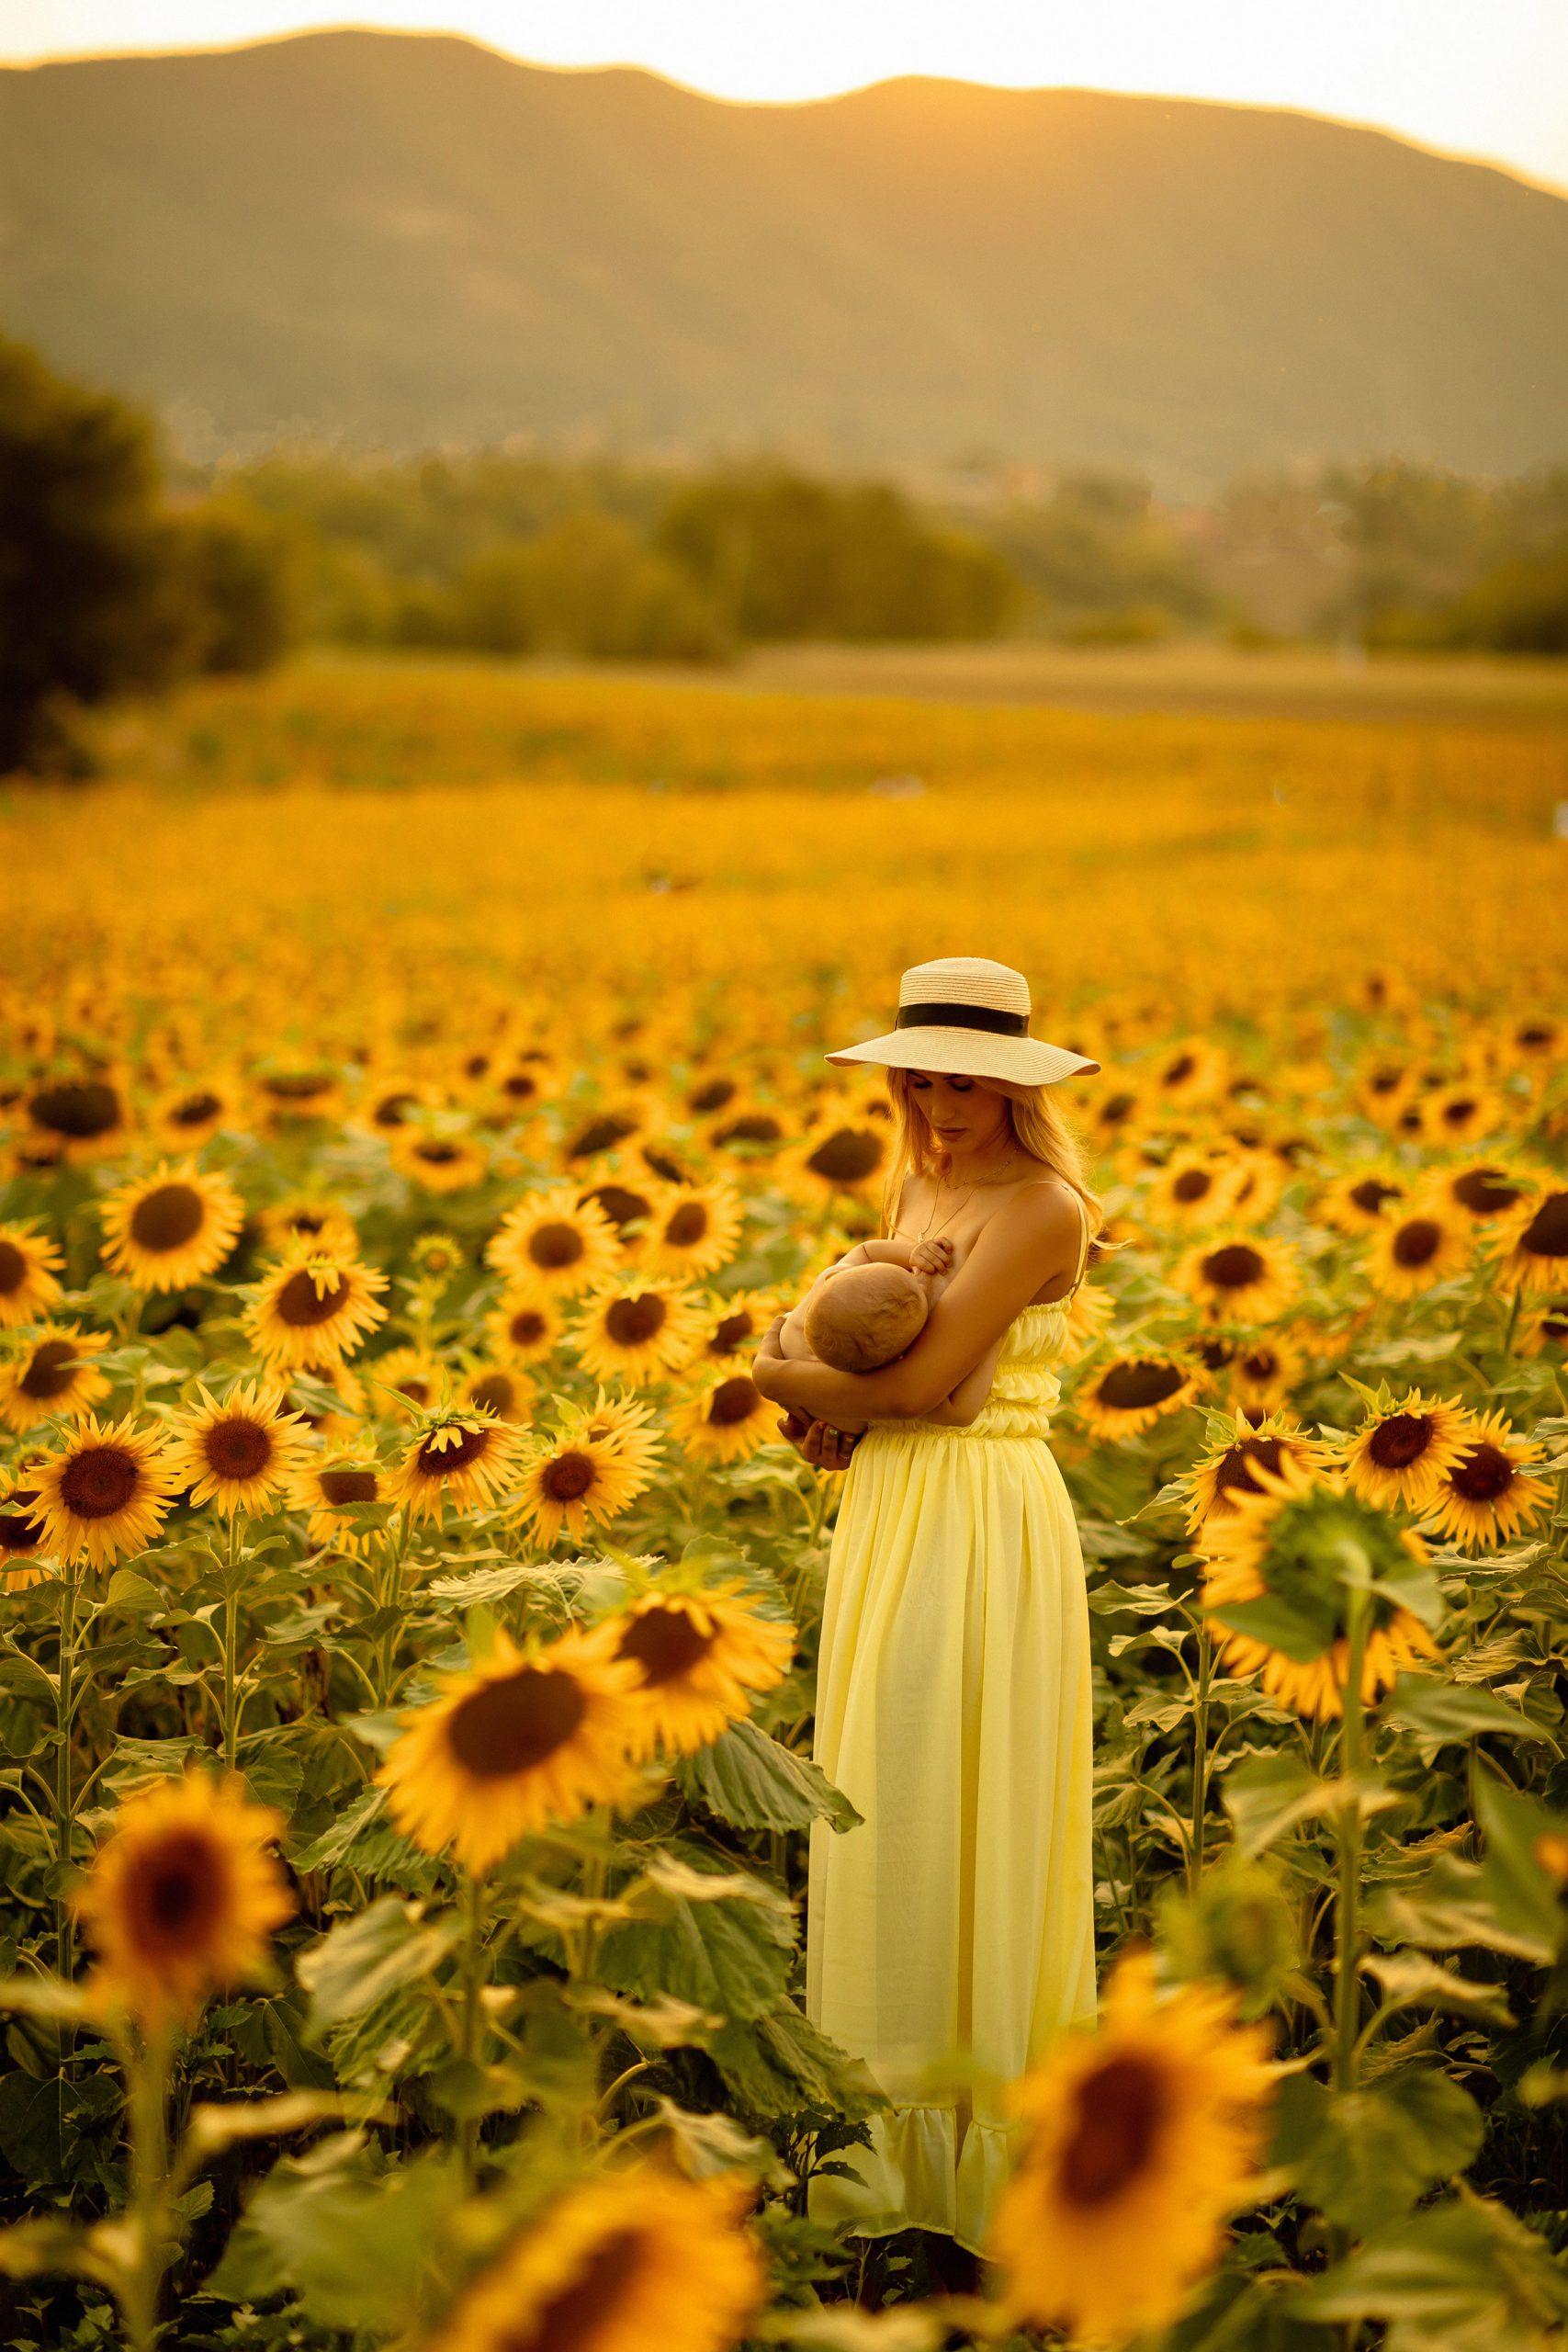 Breastfeeding photography in a sunflower field